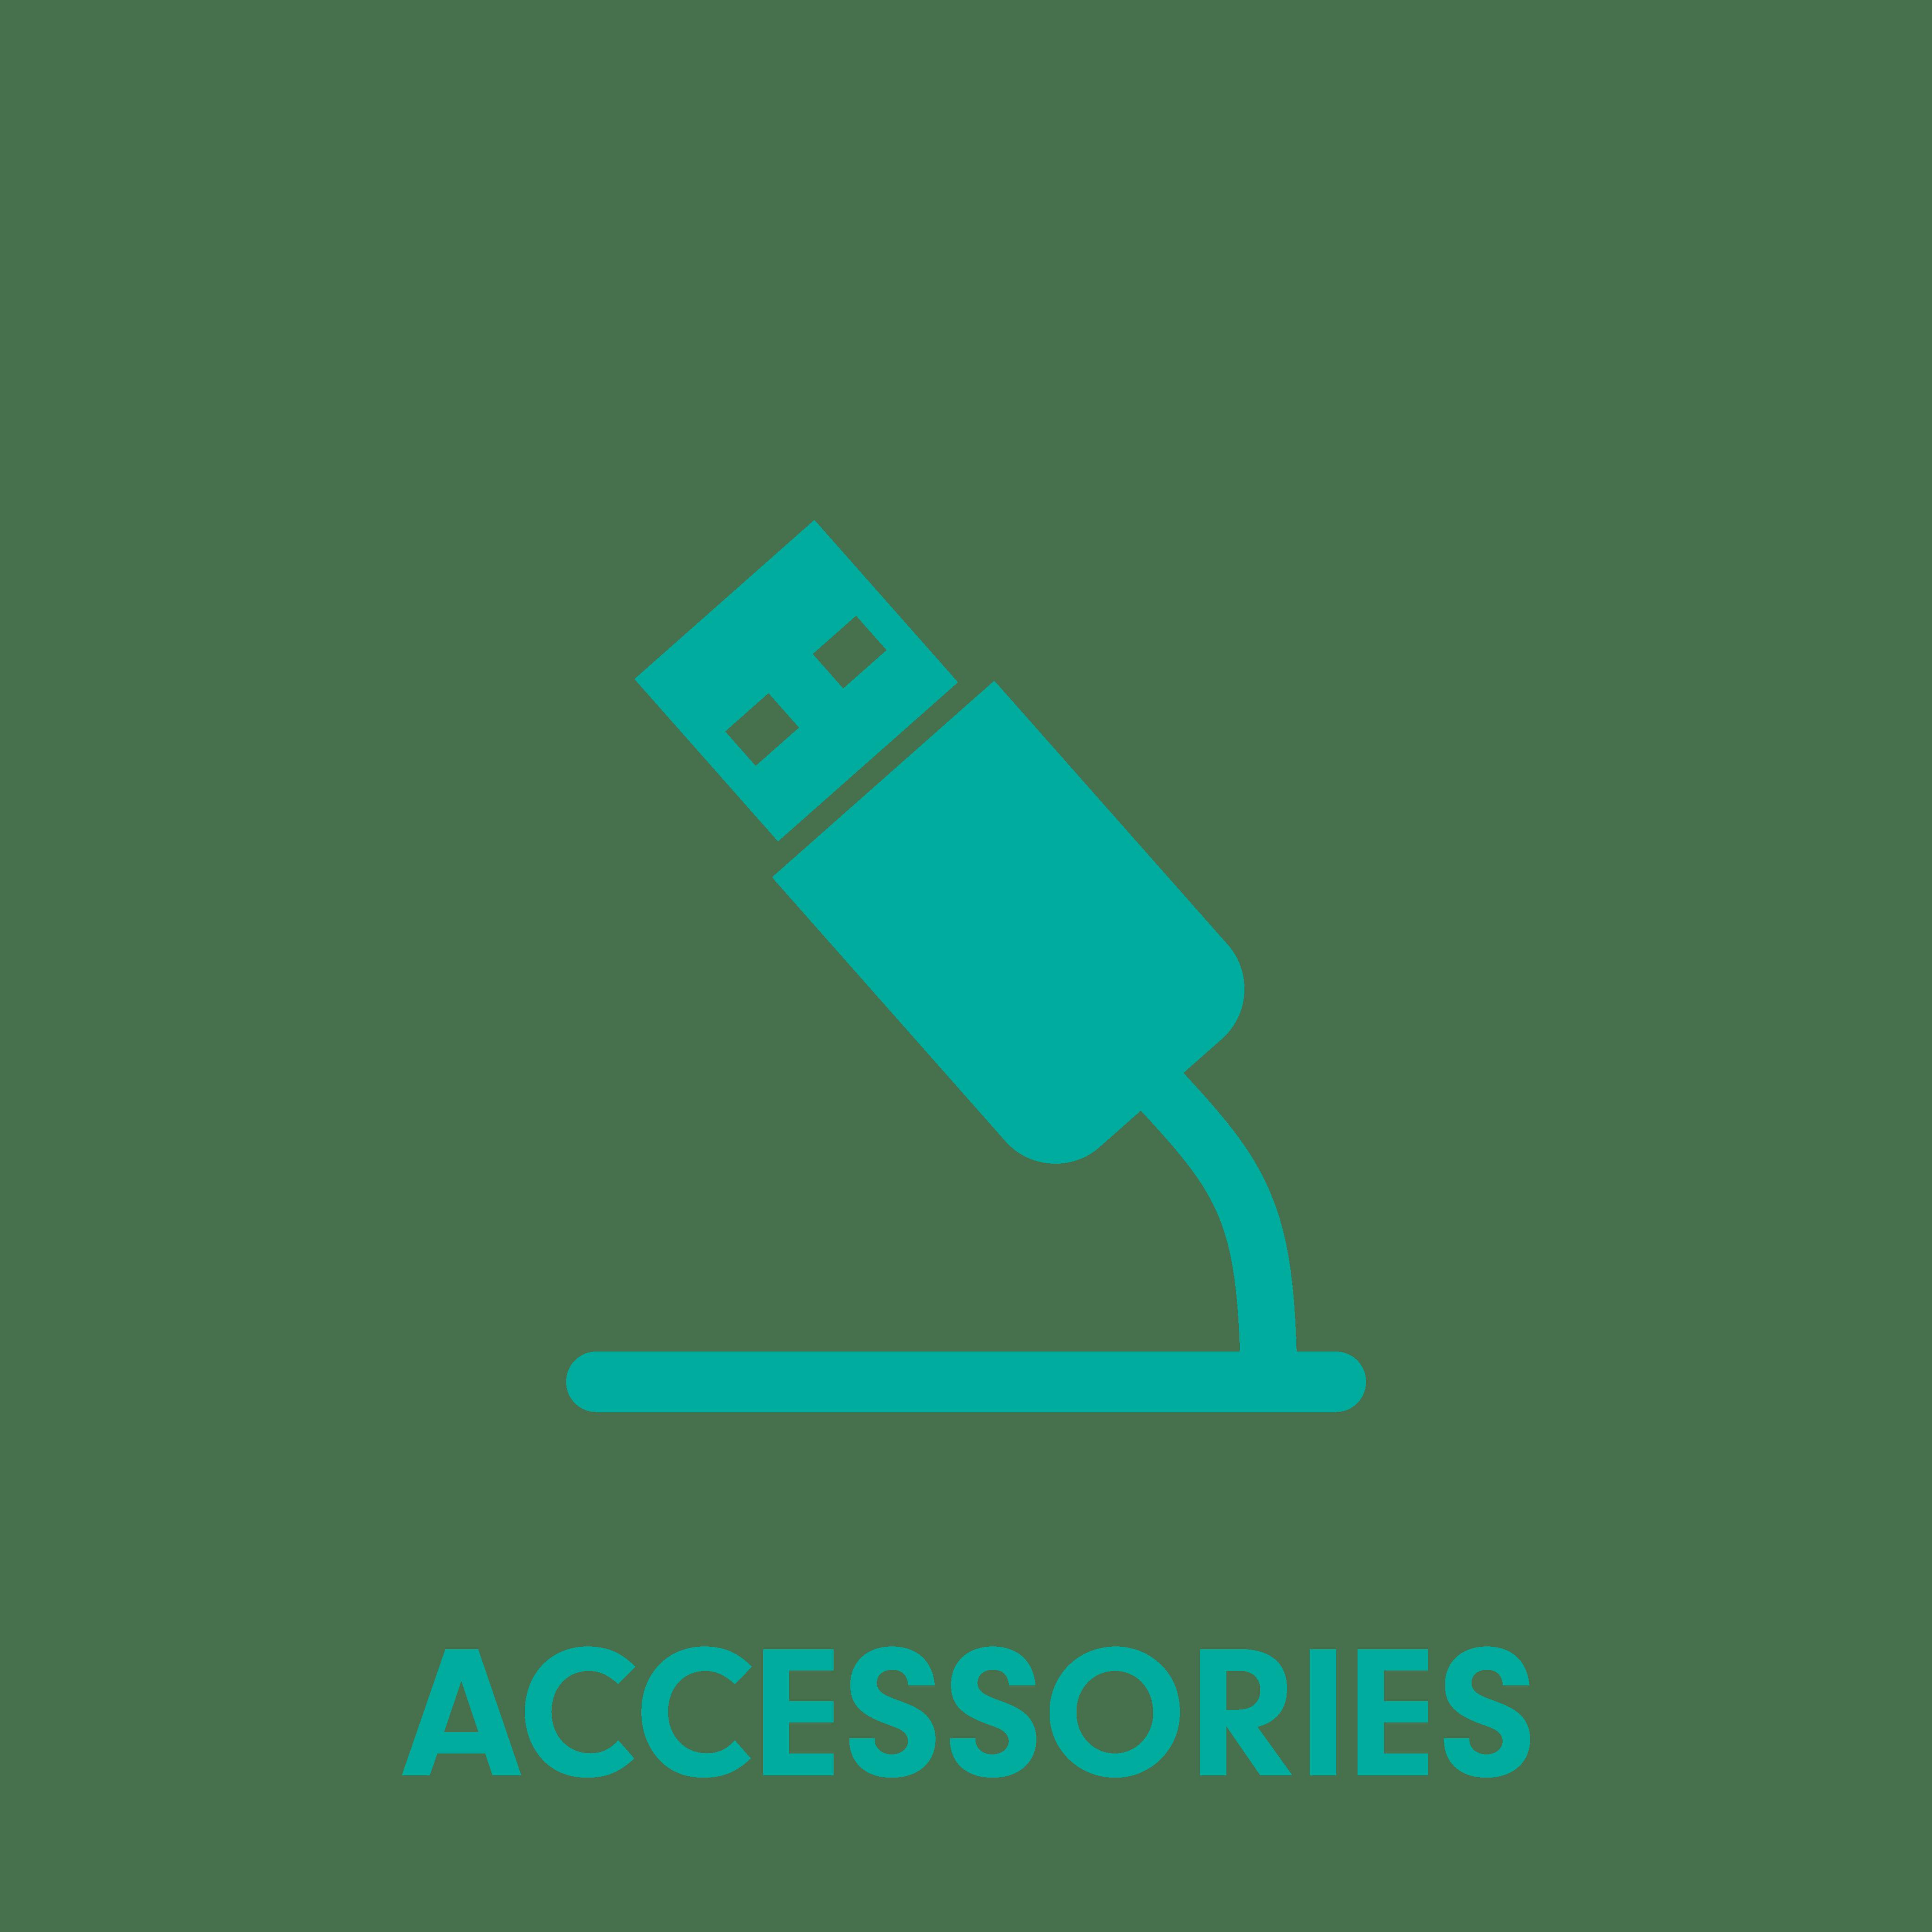 Accessories Colour Logo